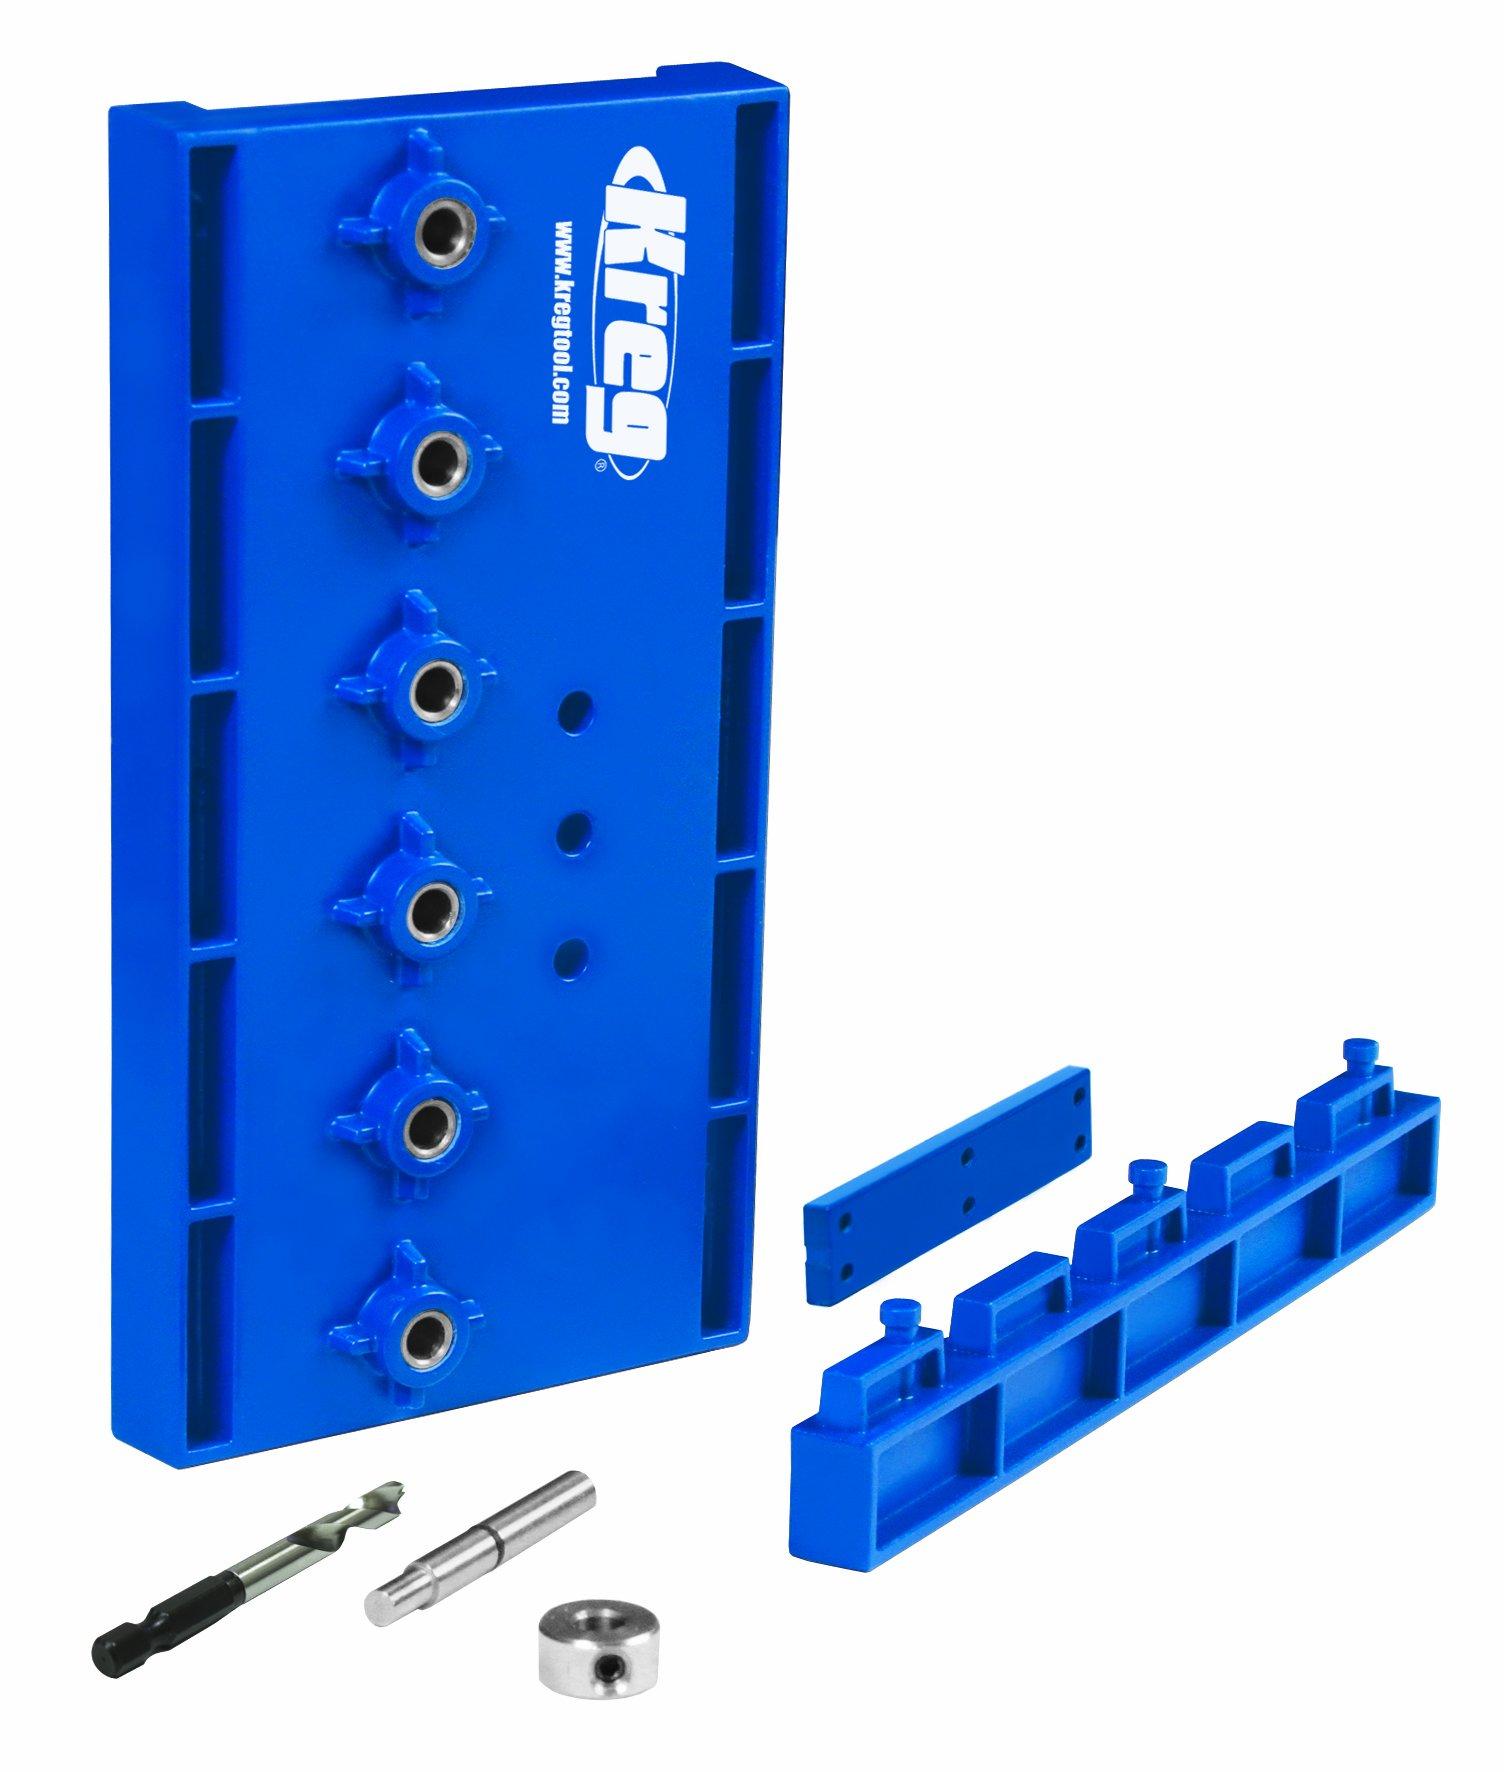 Kreg Tool Company KMA3220 5mm Shelf Pin Jig by Kreg (Image #1)